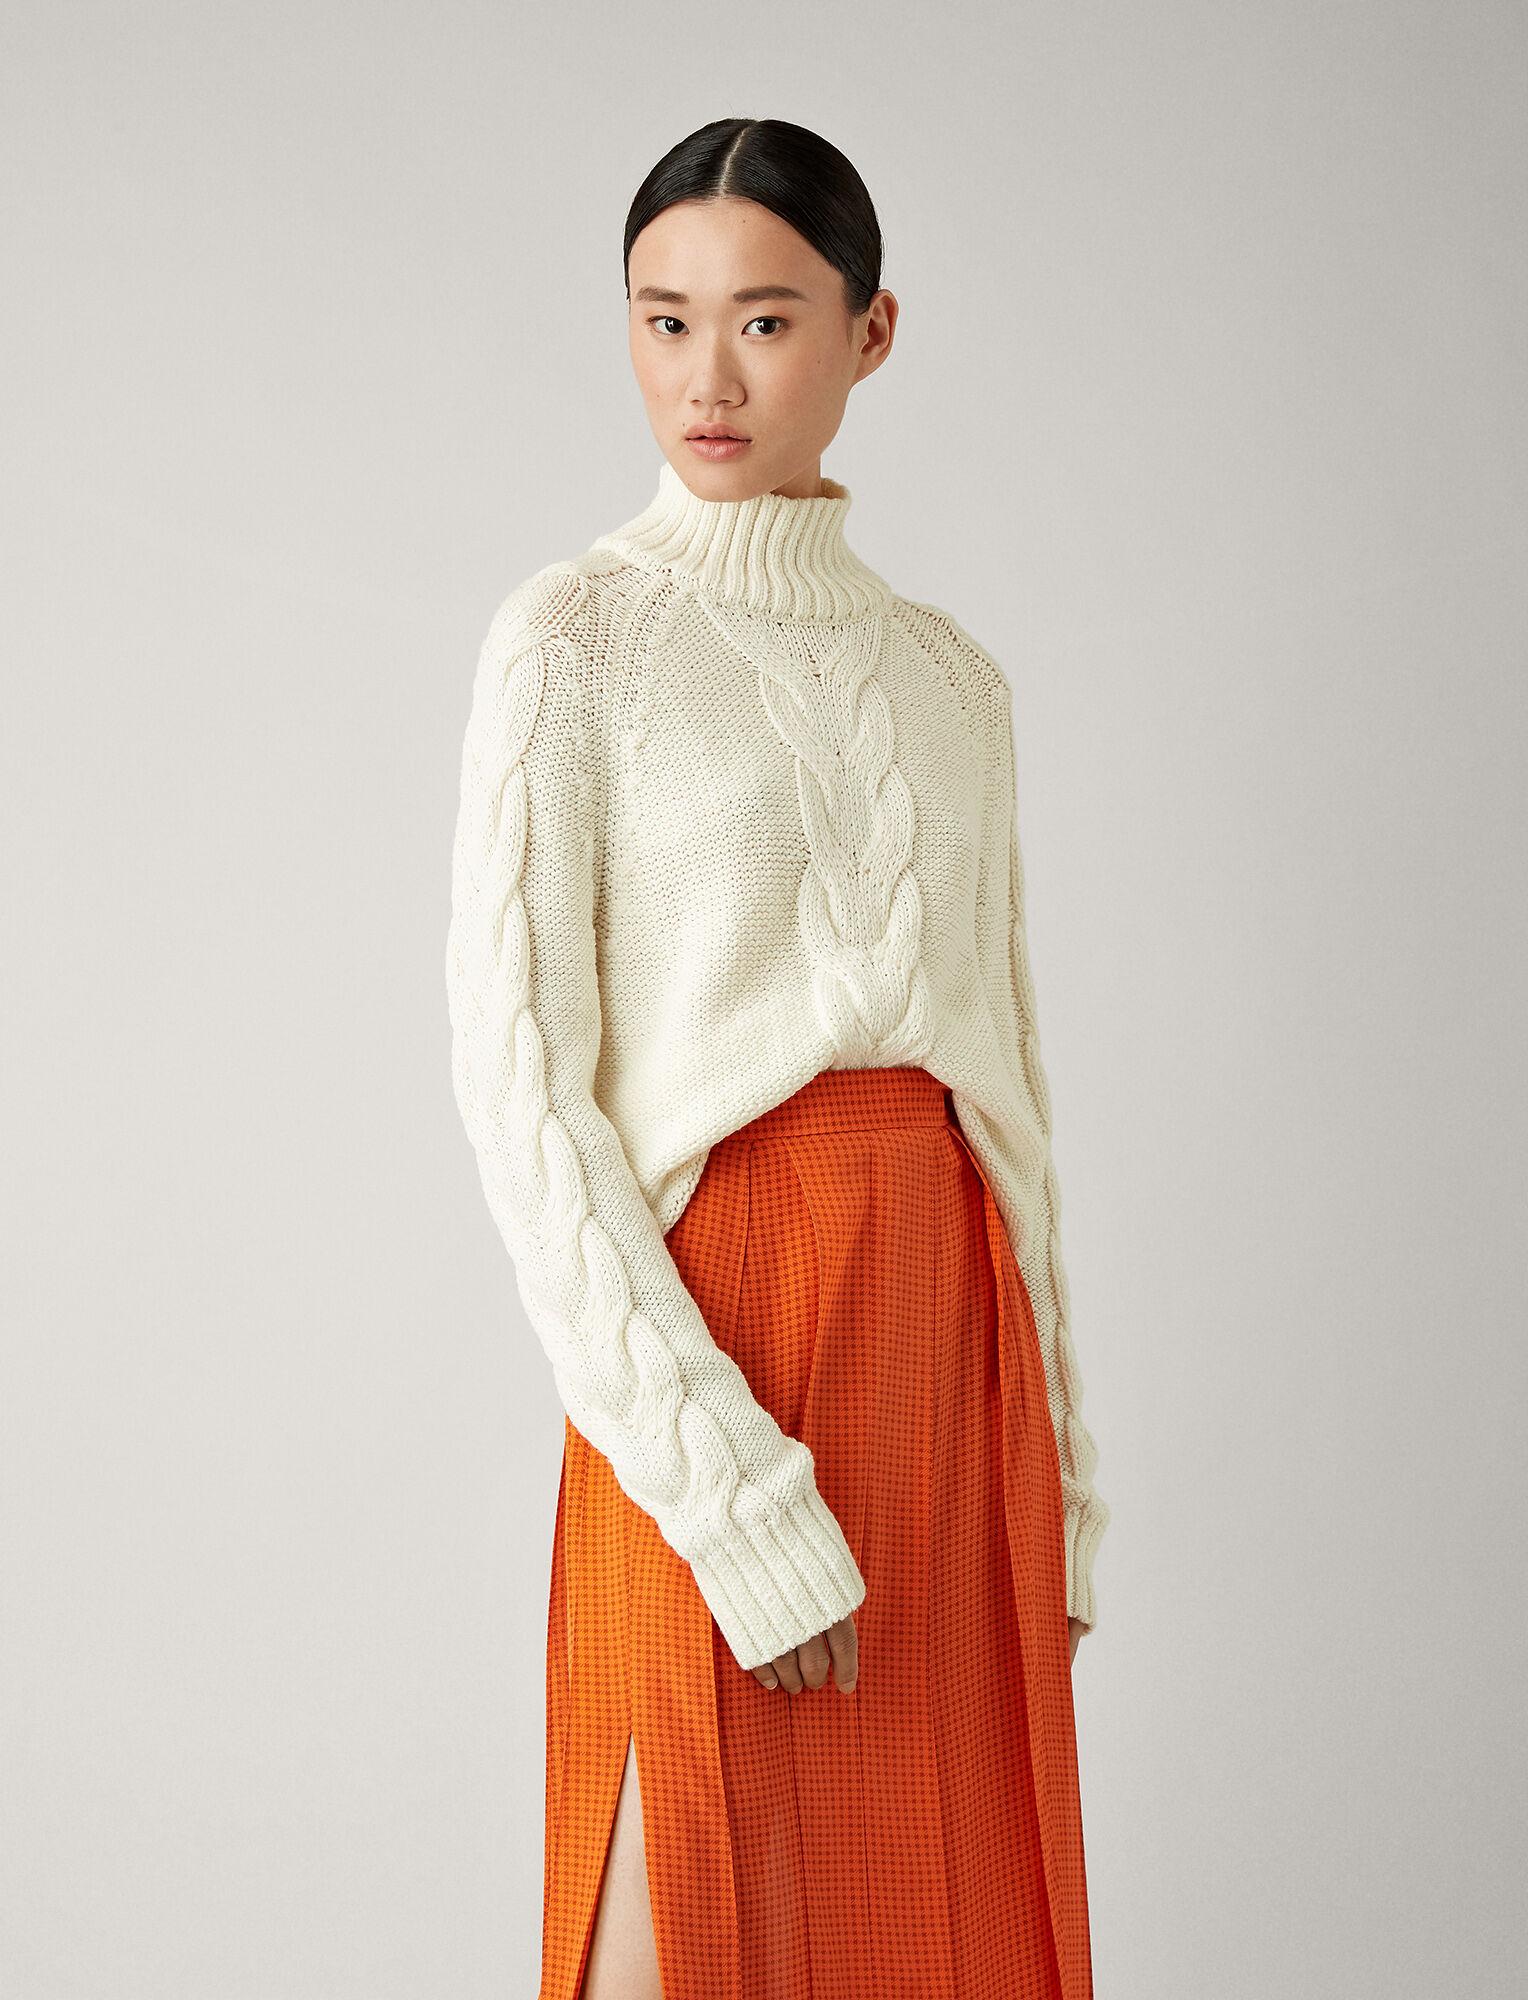 JOSEPH-High-Nk-Sweater-Chunky-Cable-Knitwear-ECRU-jf0033280040-3